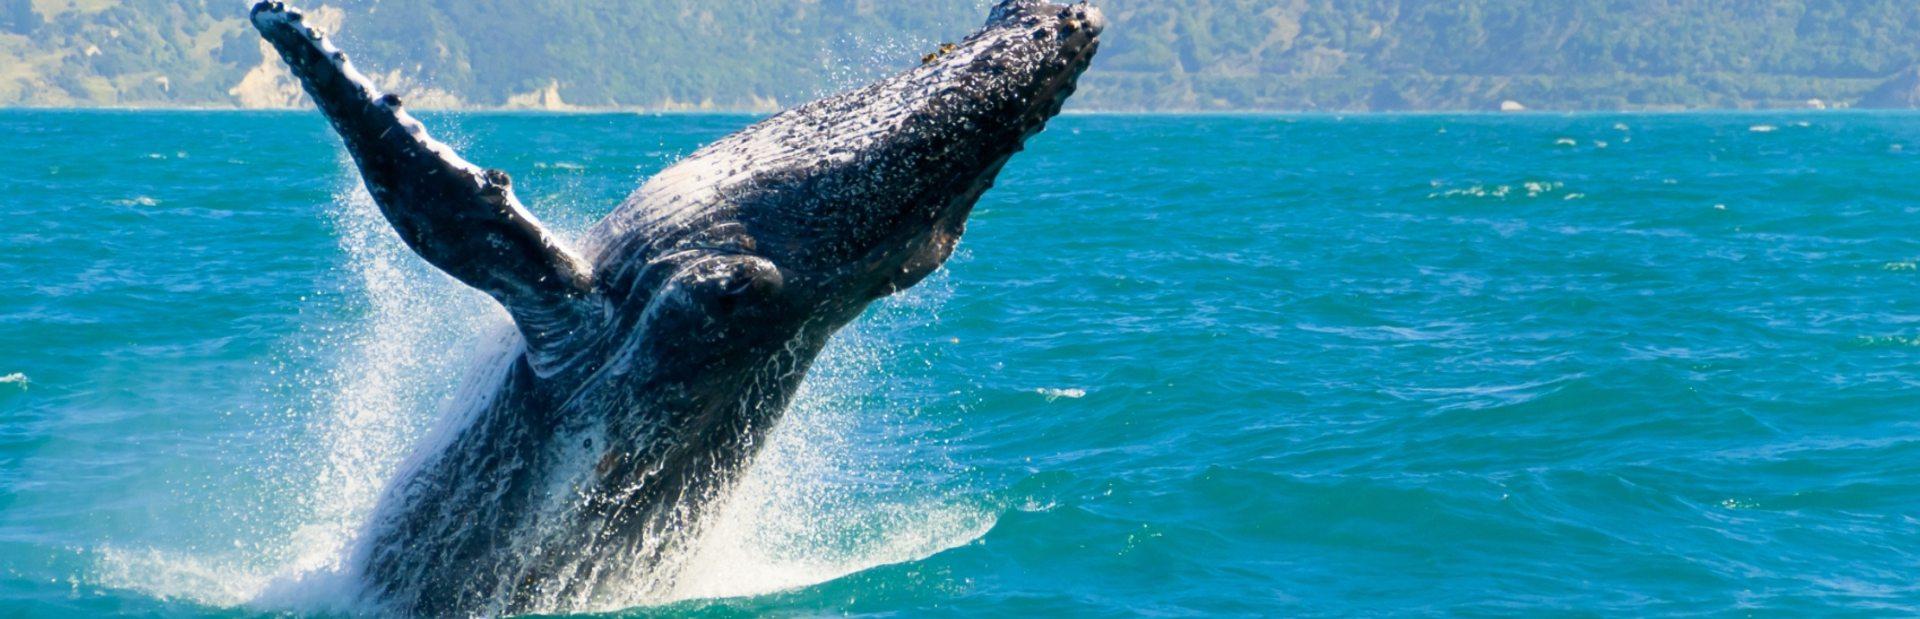 Encounter the Gentle Giants of the Pacific Ocean